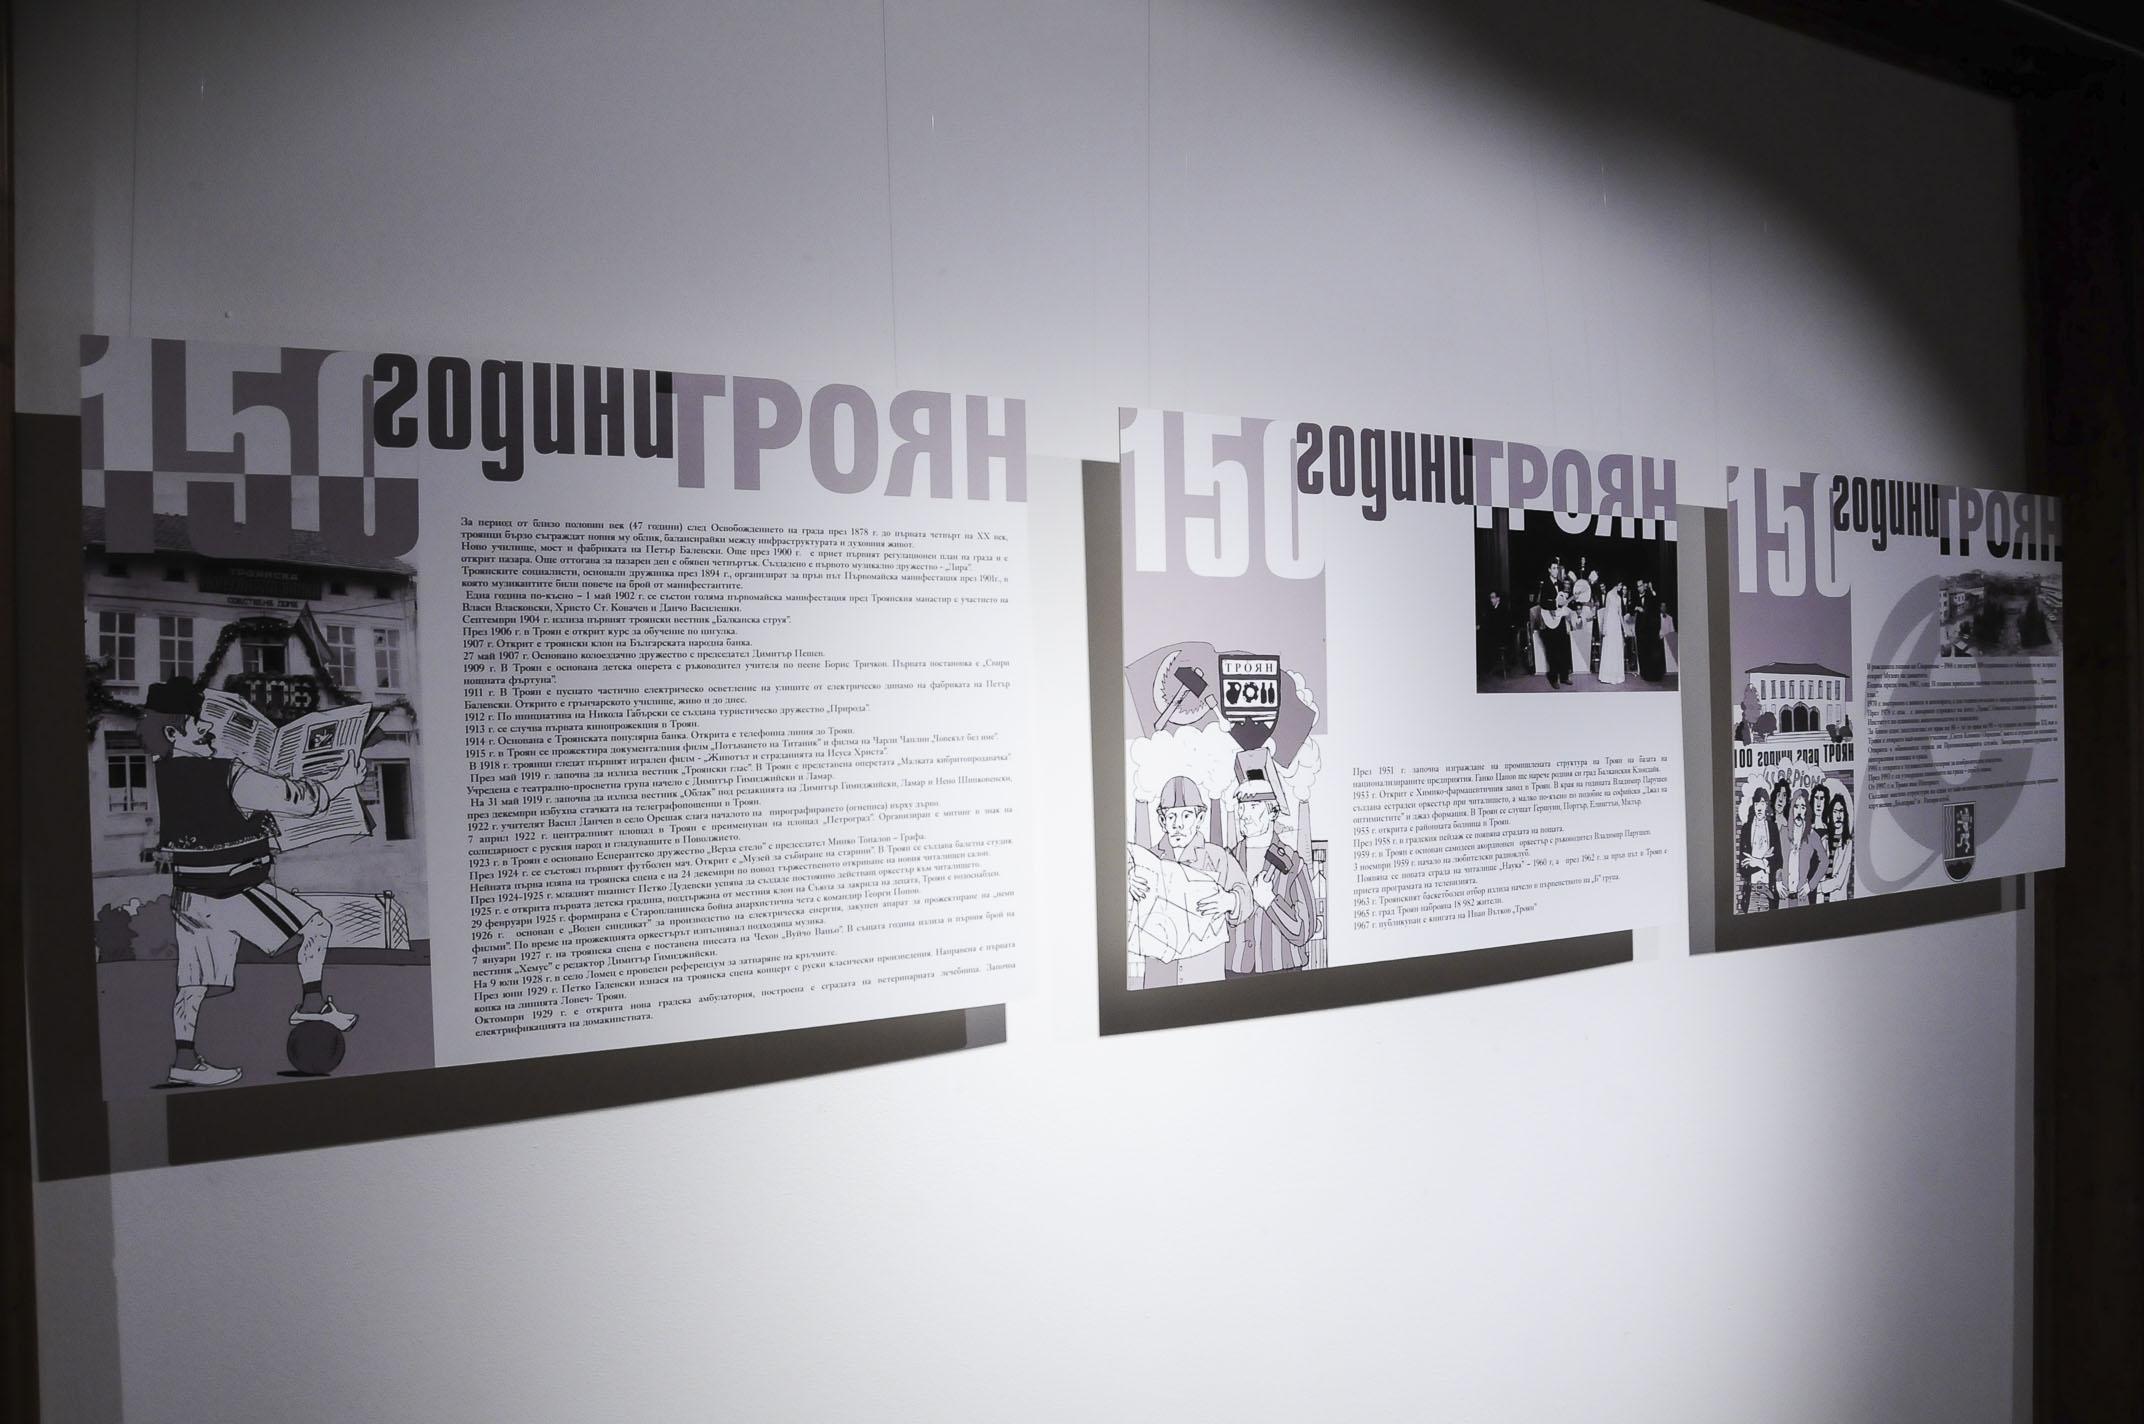 troyan-museum-provincialna-hronika-4